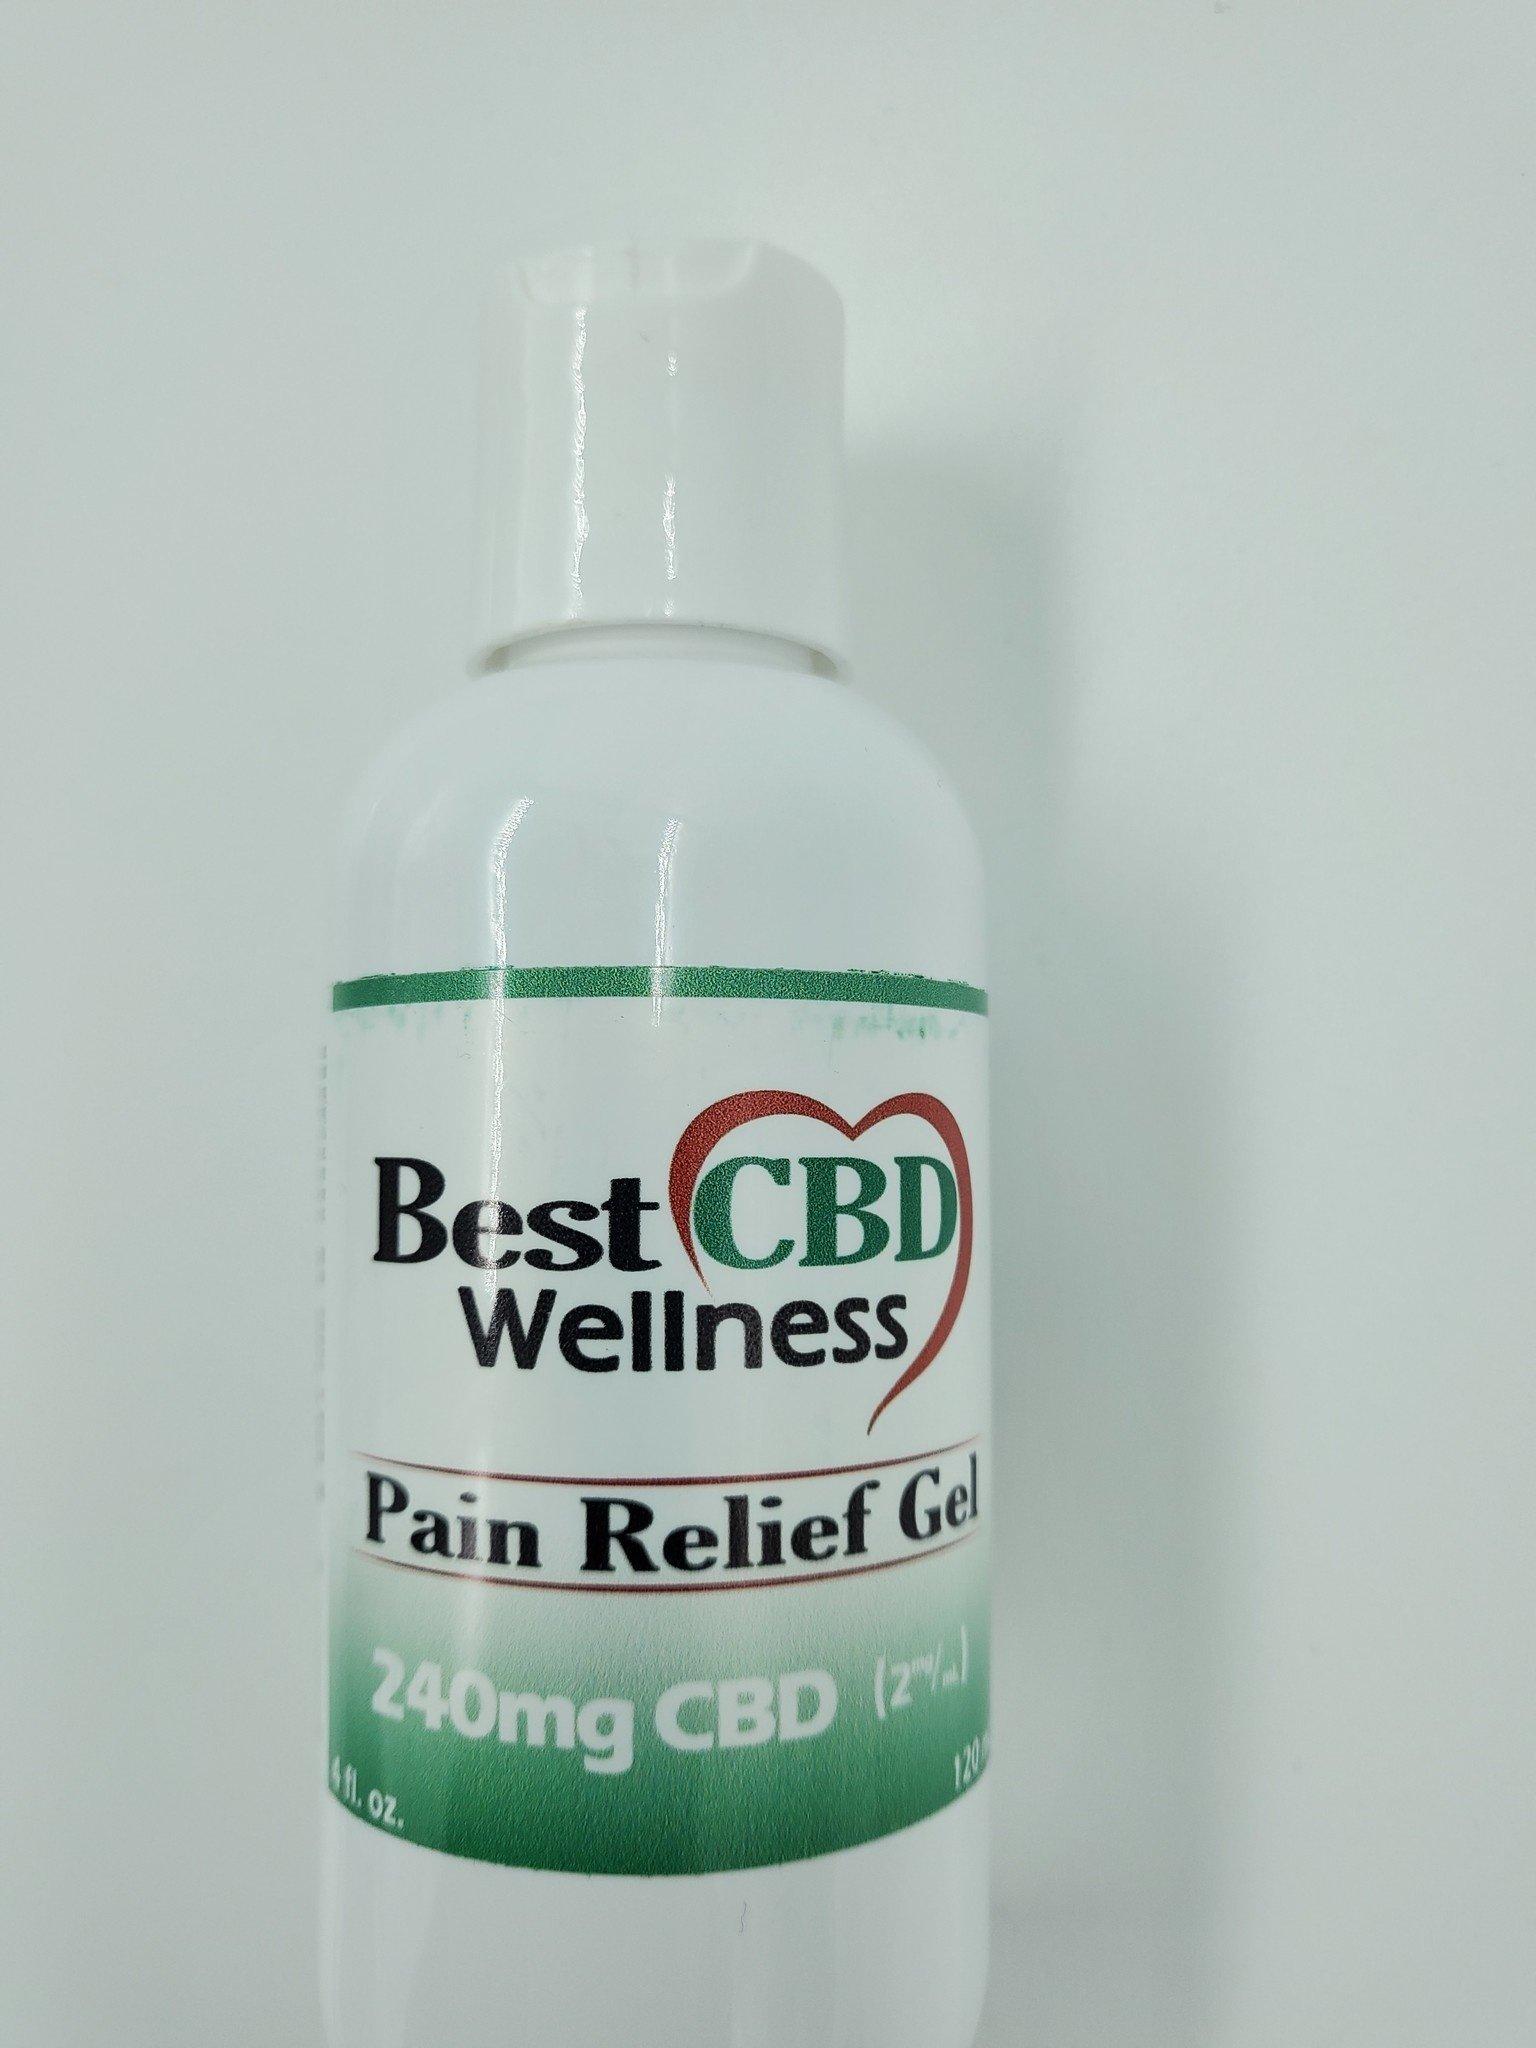 Best CBD  Pain Relief GEL Topical